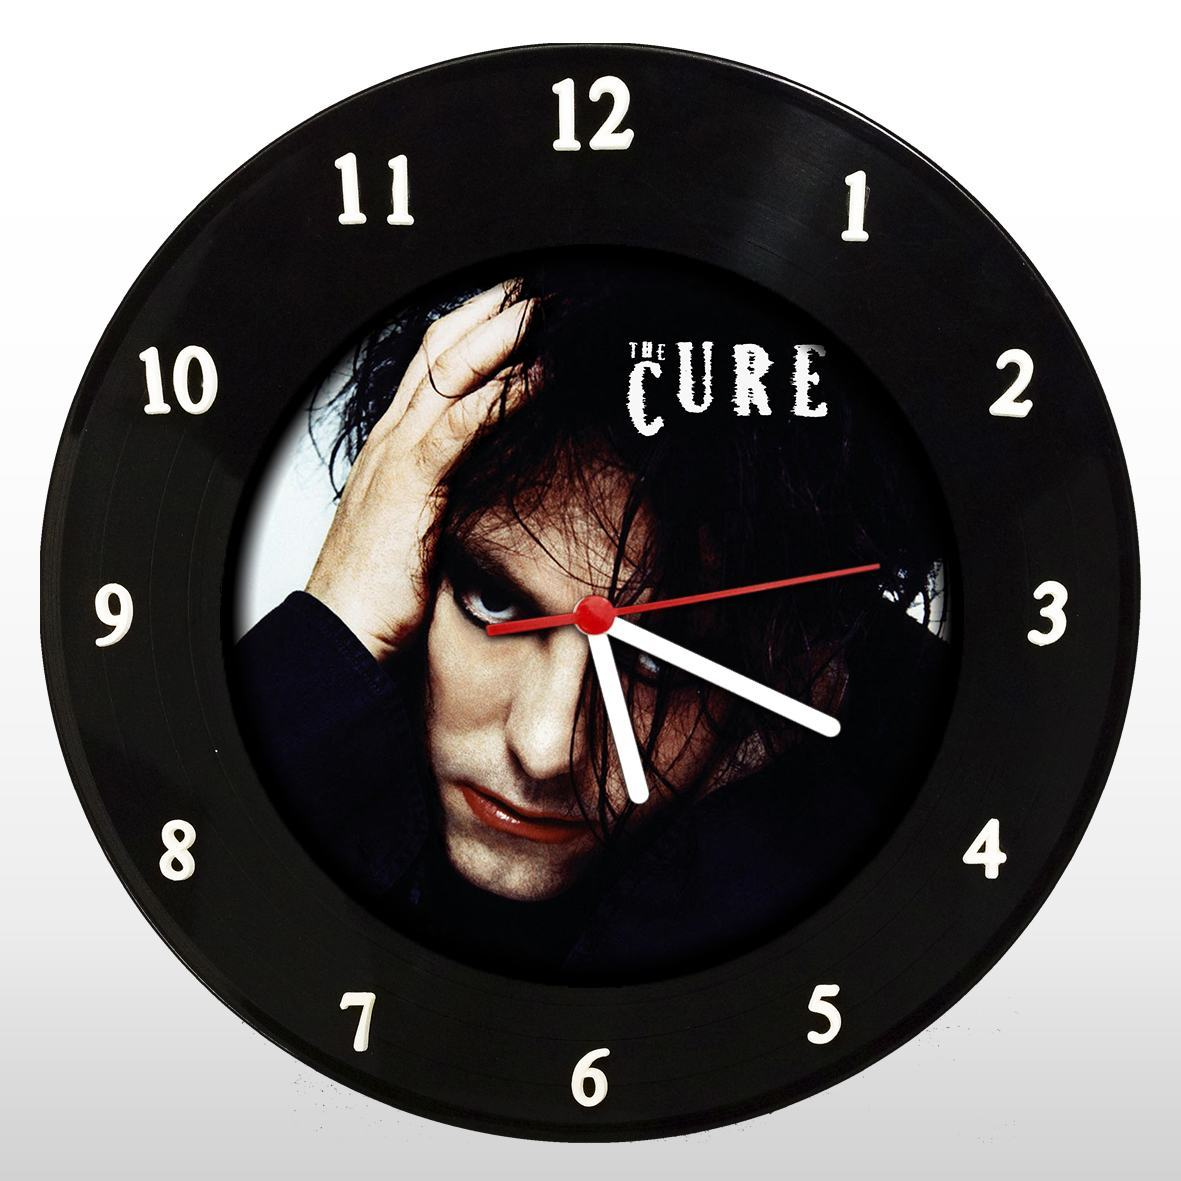 The Cure - Relógio de Parede em Disco de Vinil - Mr. Rock